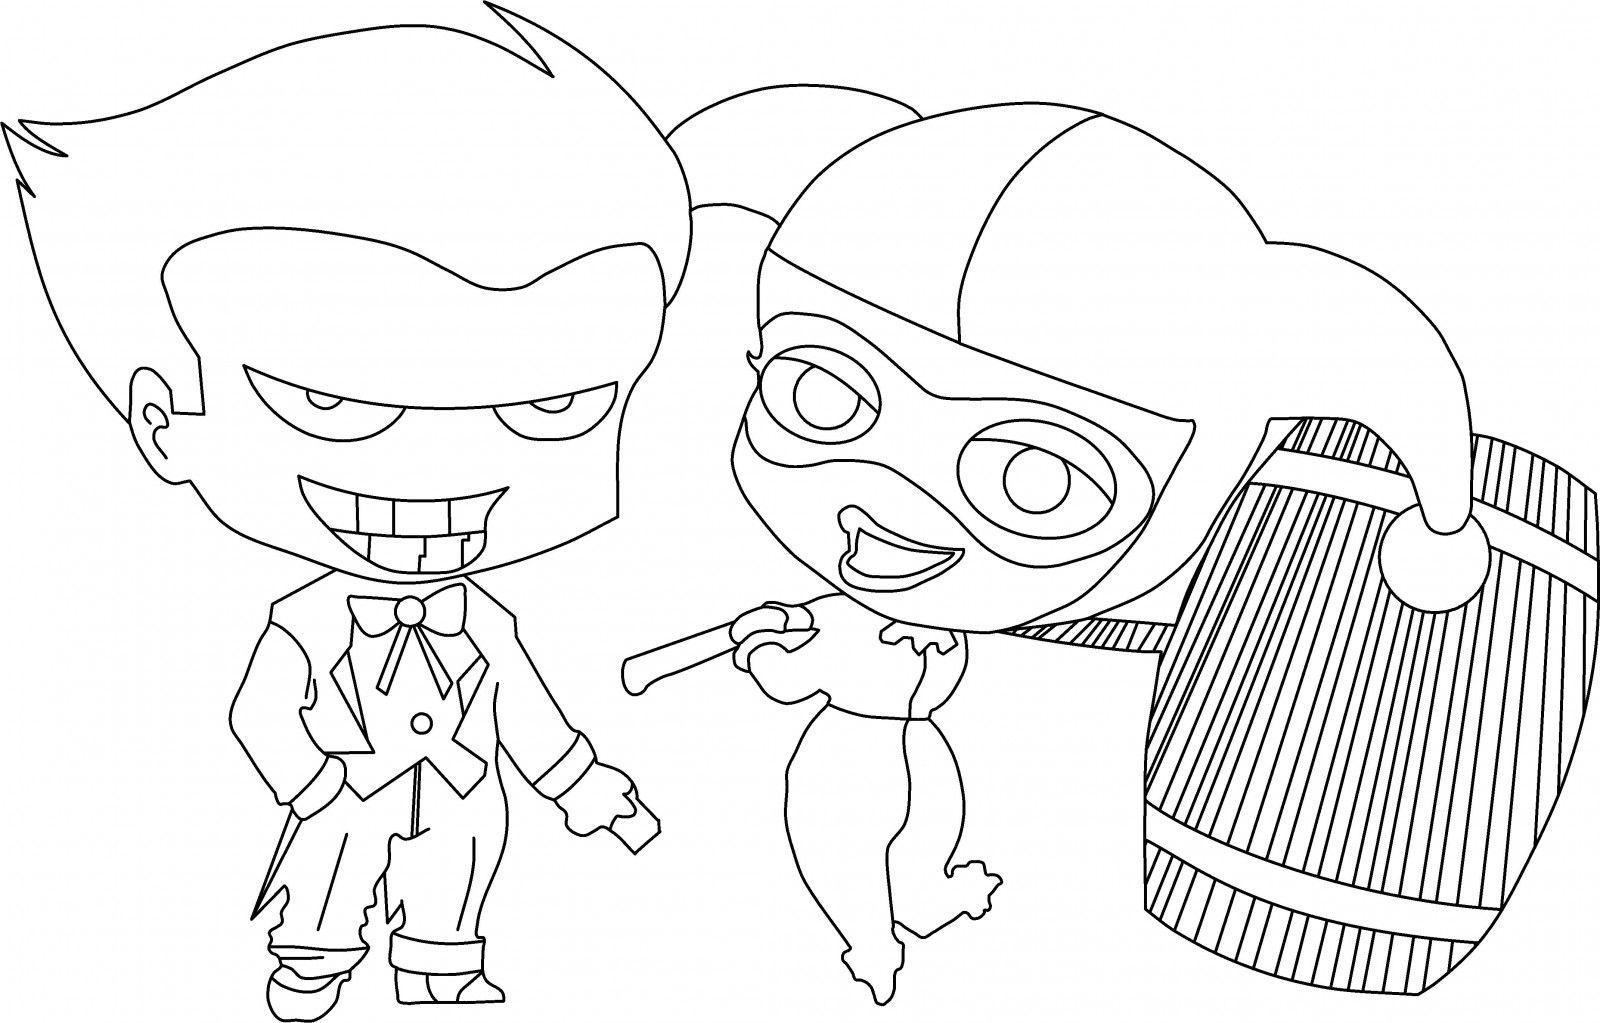 Harley Quinn Kawaii Para Colorear: Dibujos Kawaii De Harley Quinn Para Colorear